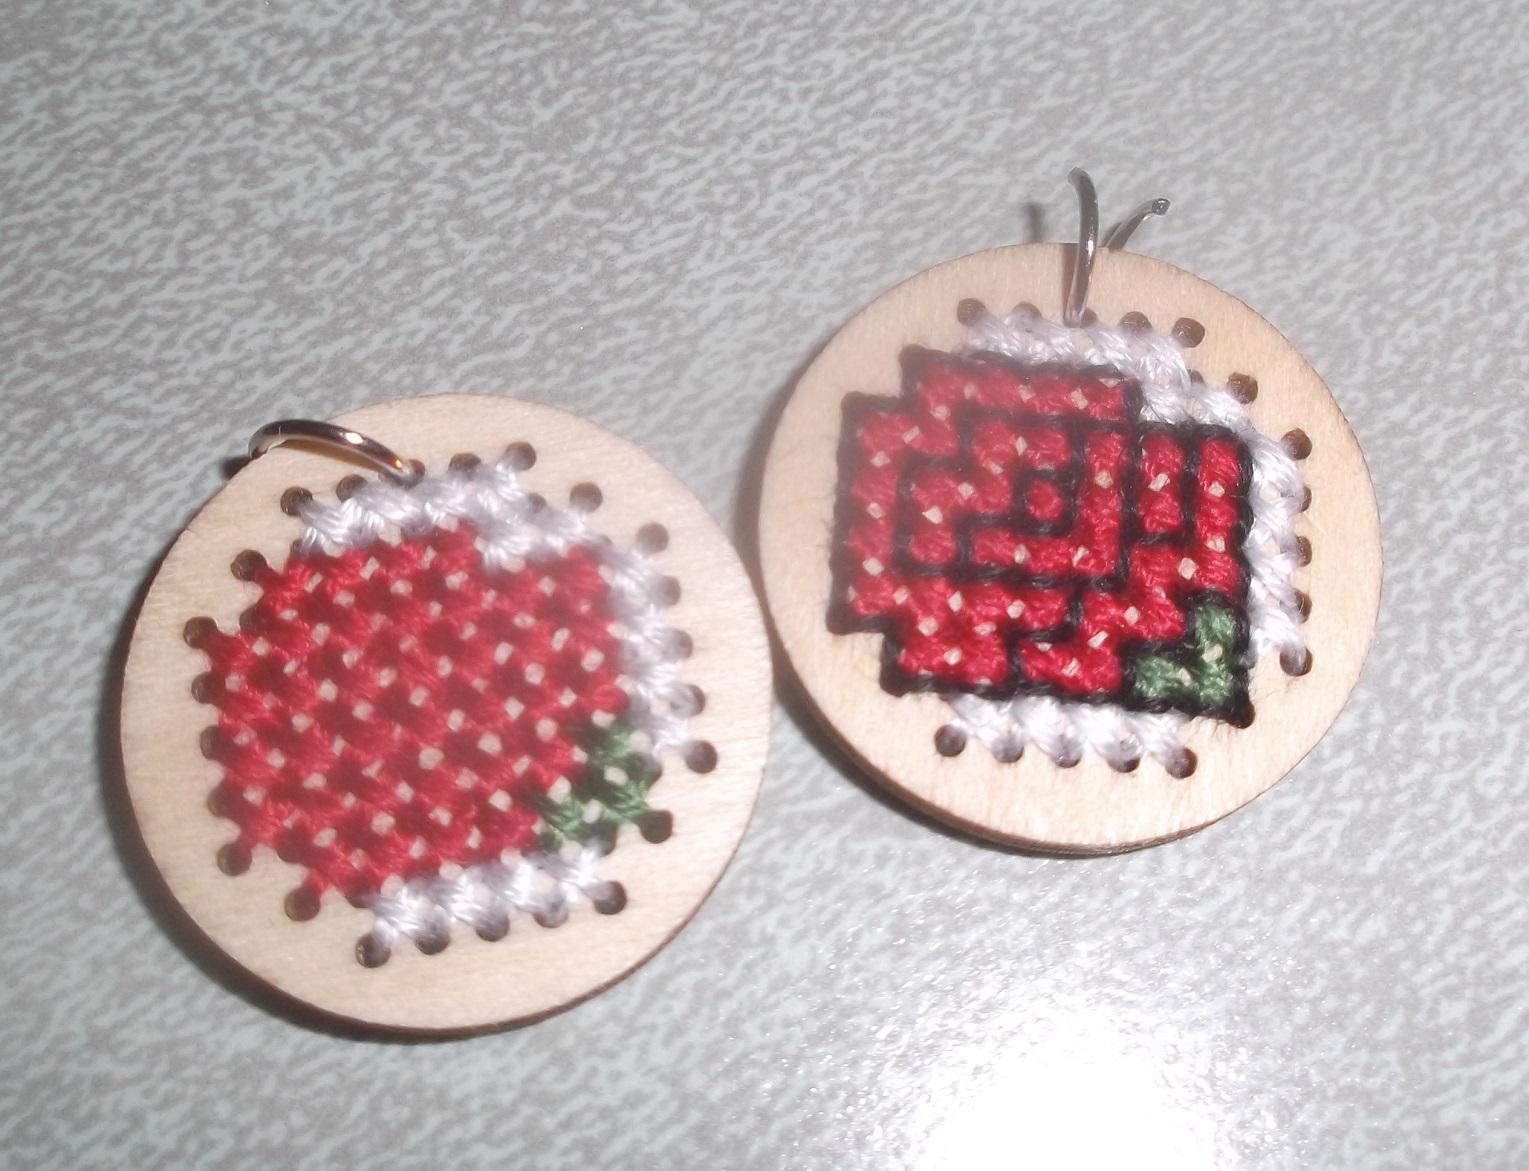 Photo I took of the Rose Earrings I'm making